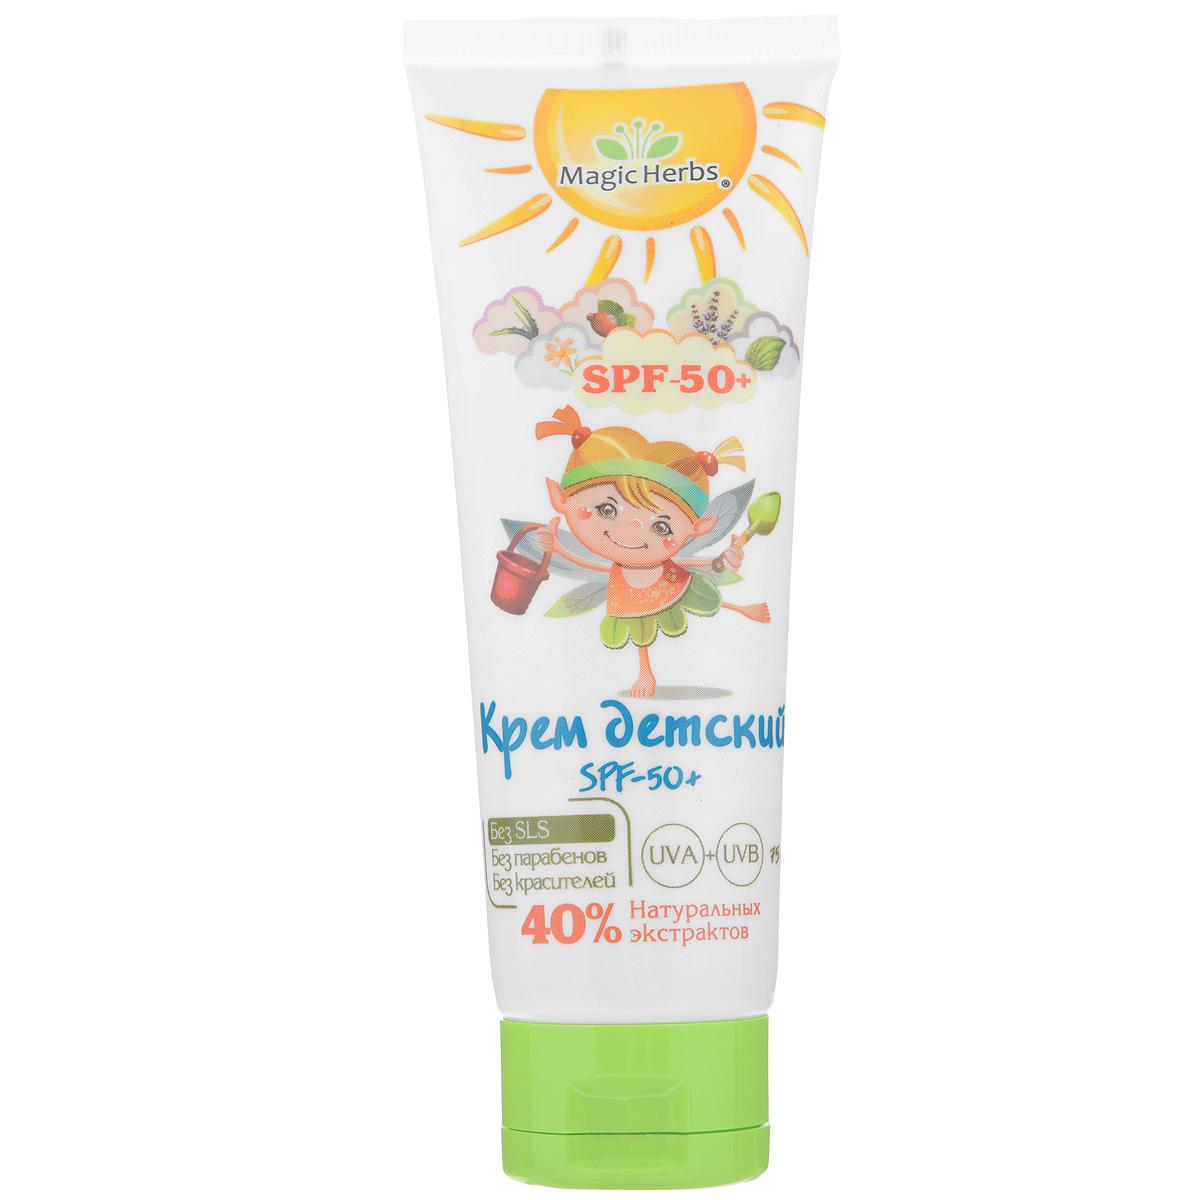 Magic Herbs Крем детский солнцезащитный, SPF-50, 75 мл